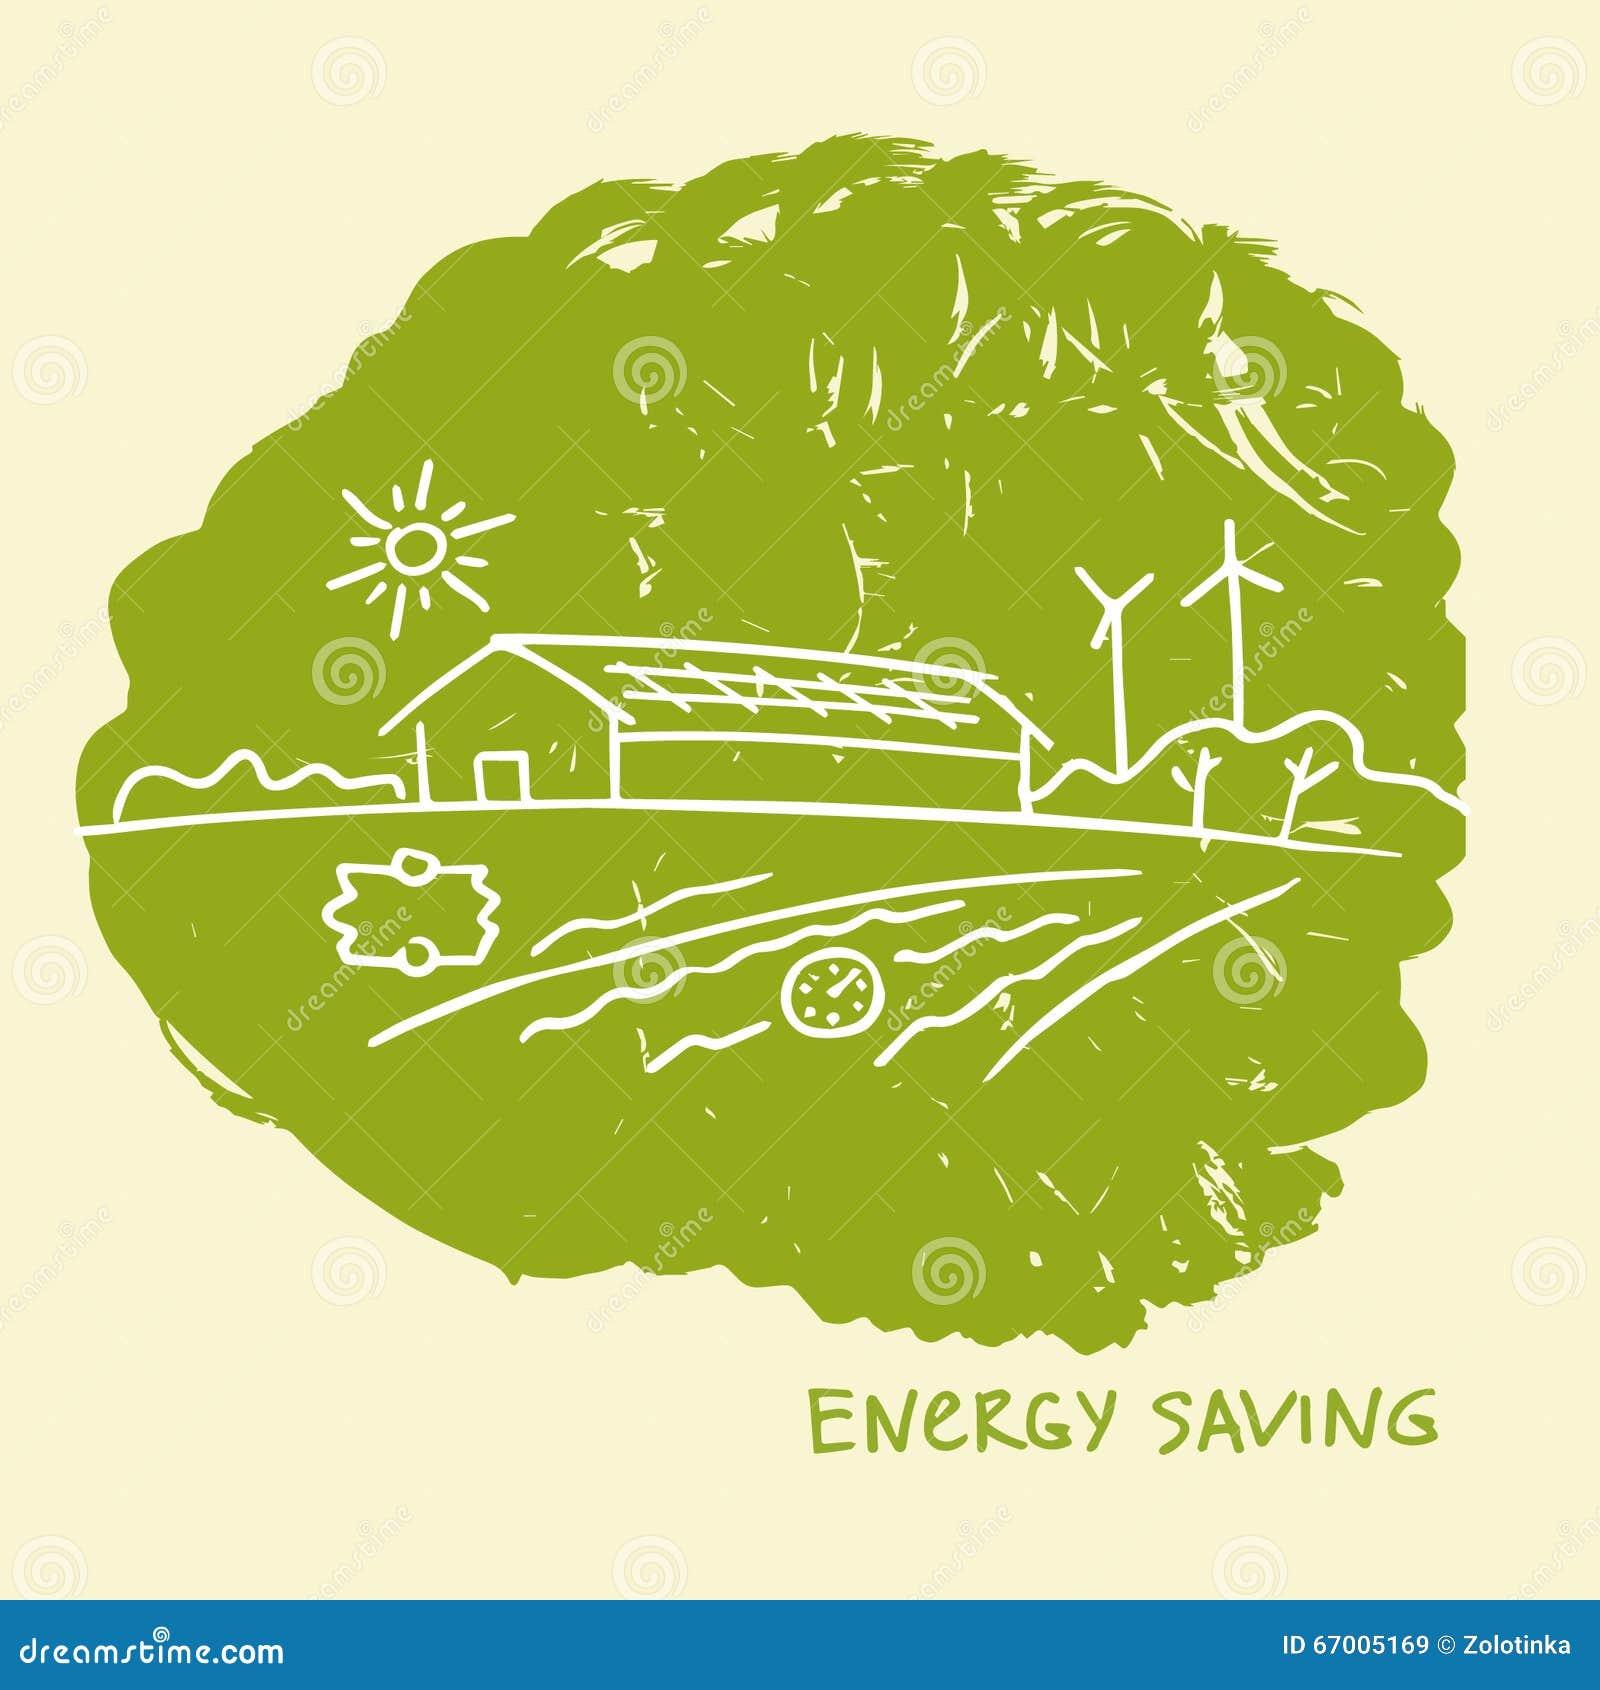 Eco Friendly Construction Vector Illustration Energy Efficient Constructionenergy Saving